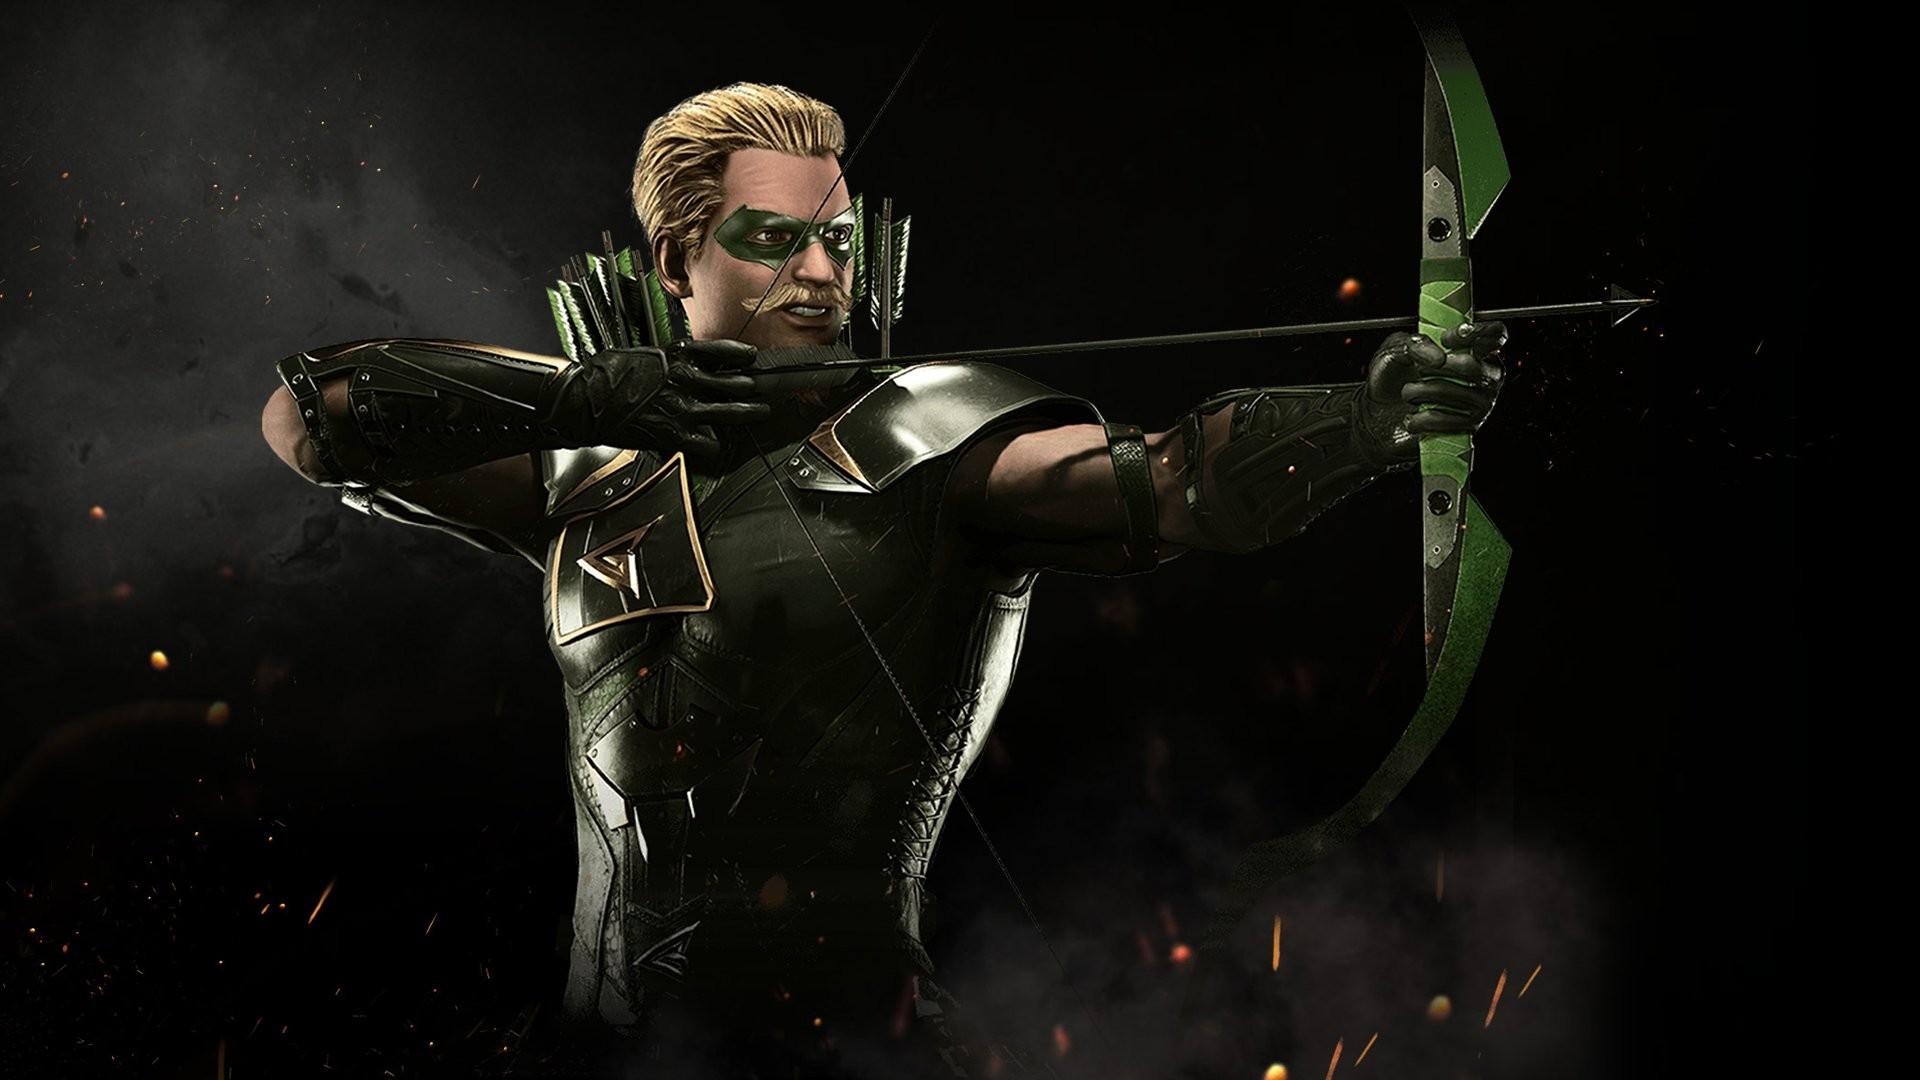 Video Game – Injustice 2 Green Arrow Wallpaper